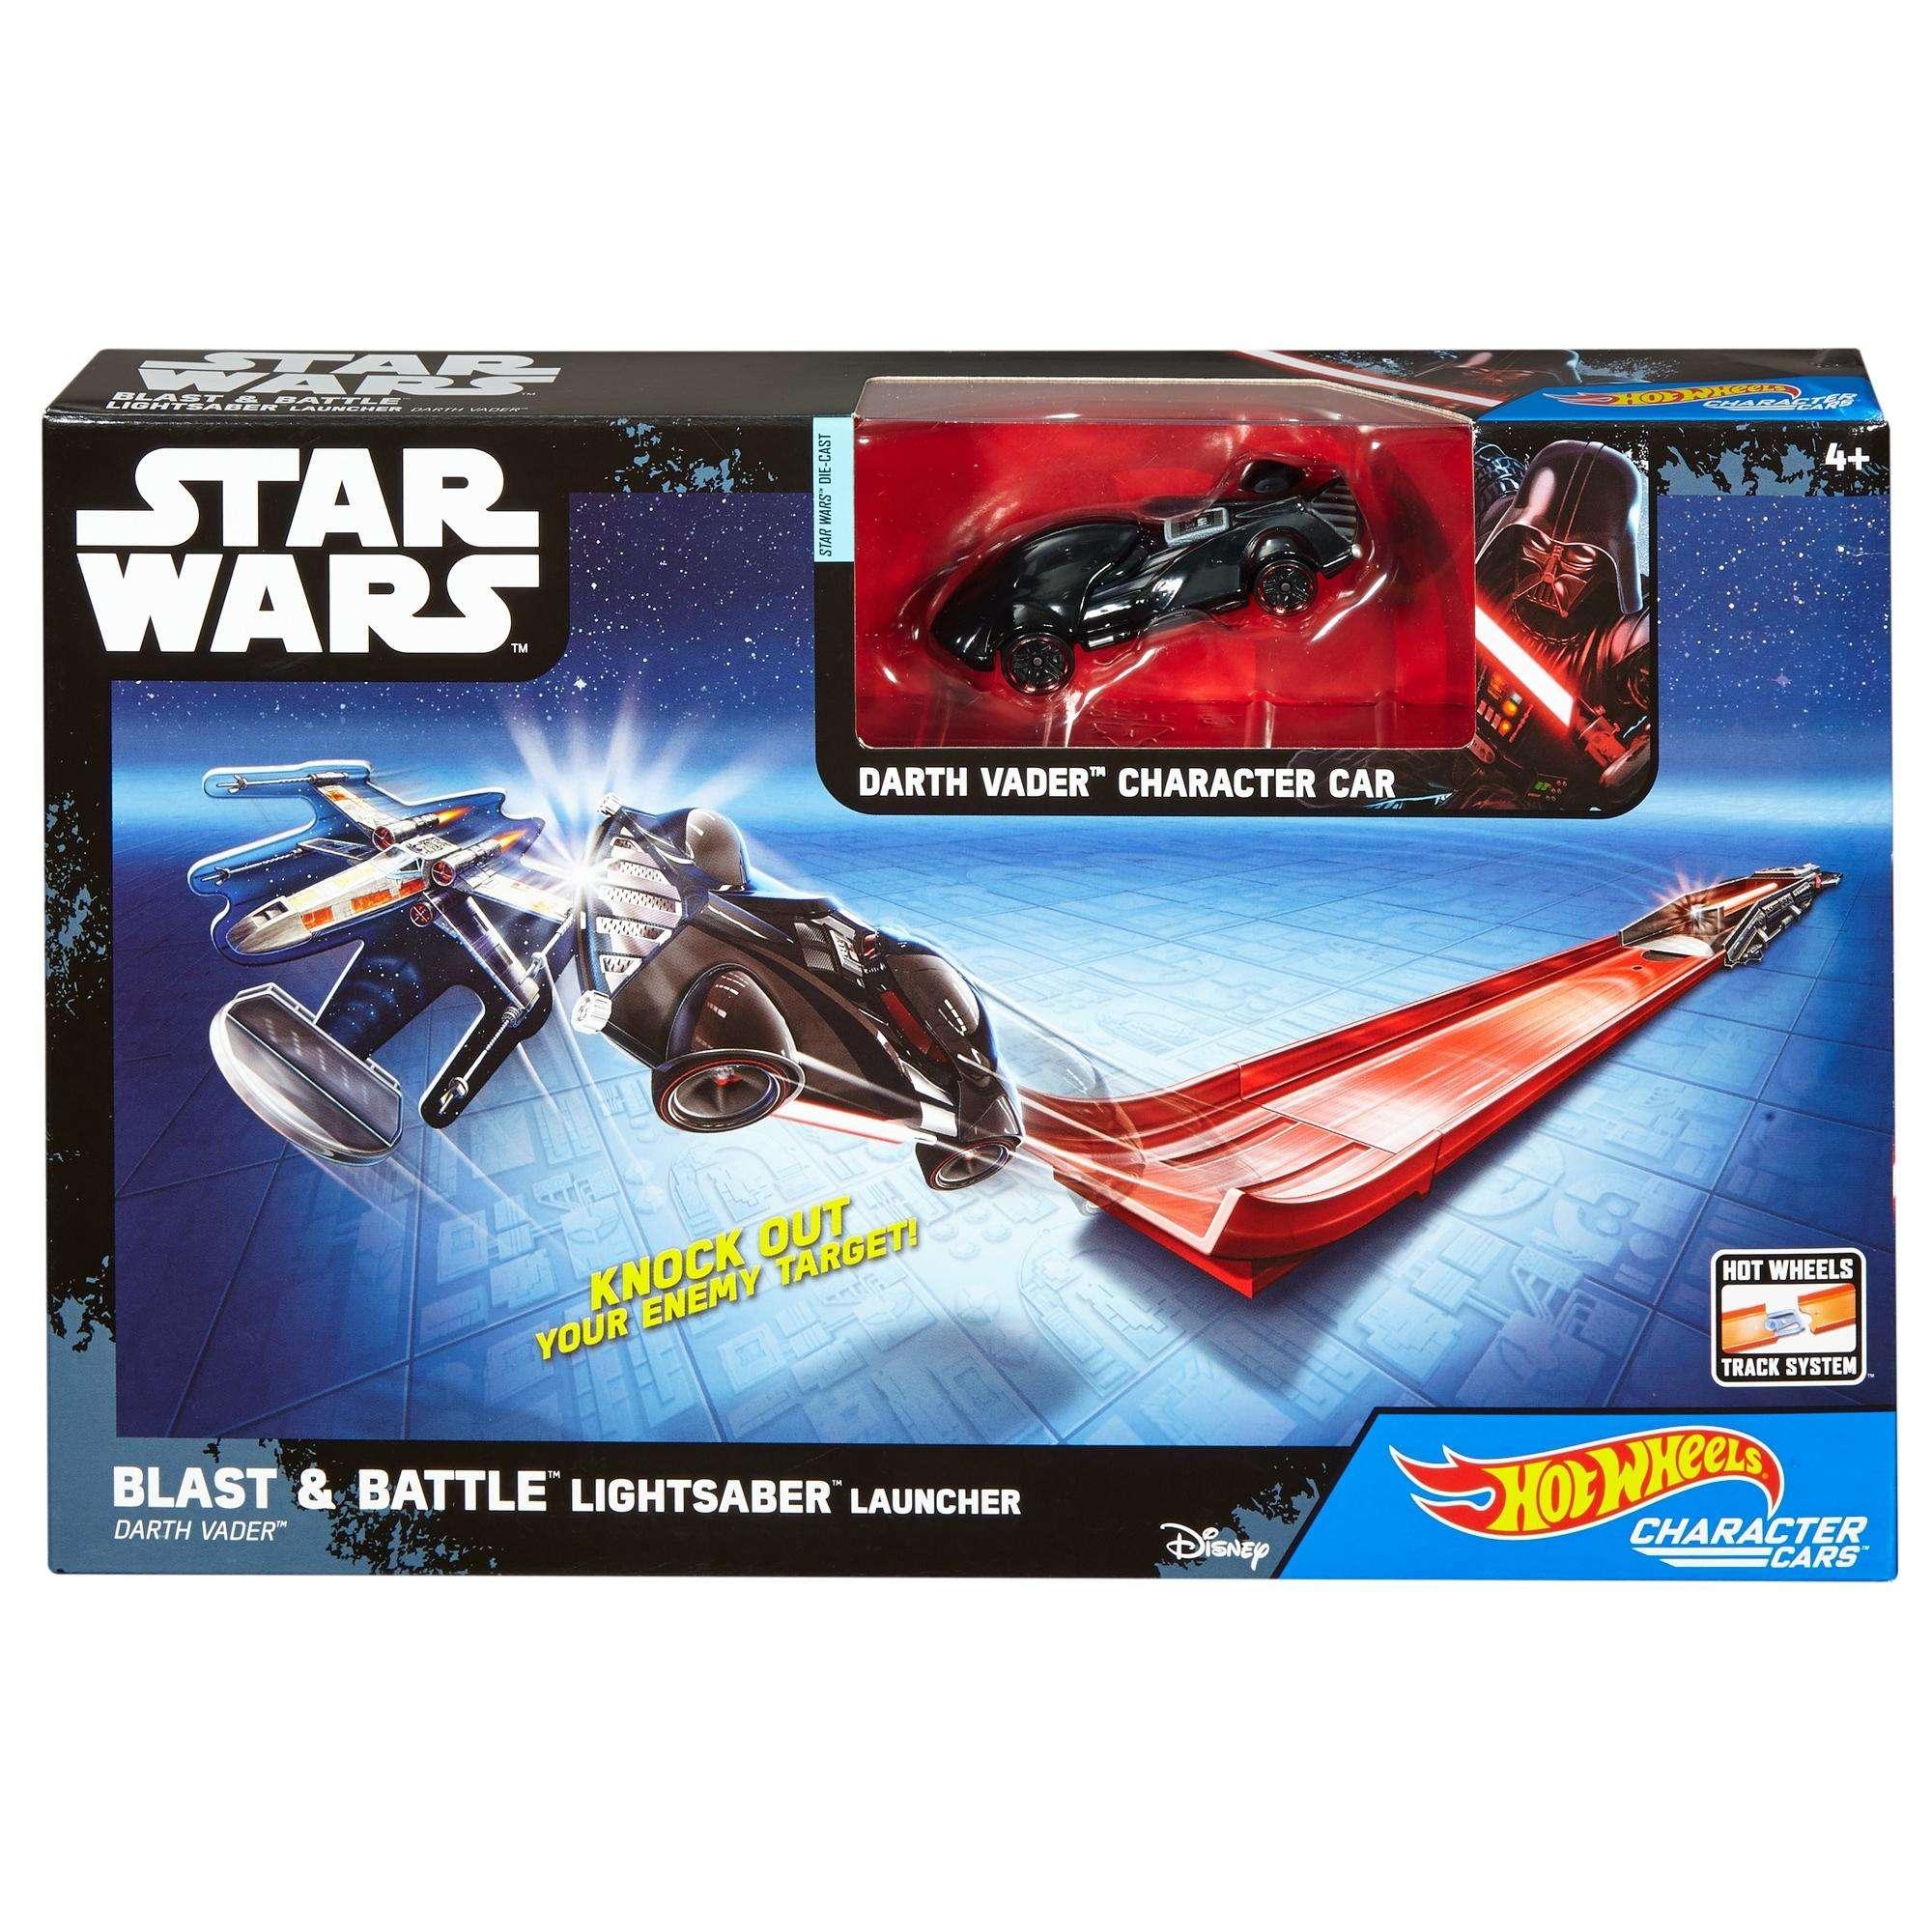 RO Hot Wheels Lightsaber Blast & Battle Launcher Set 1